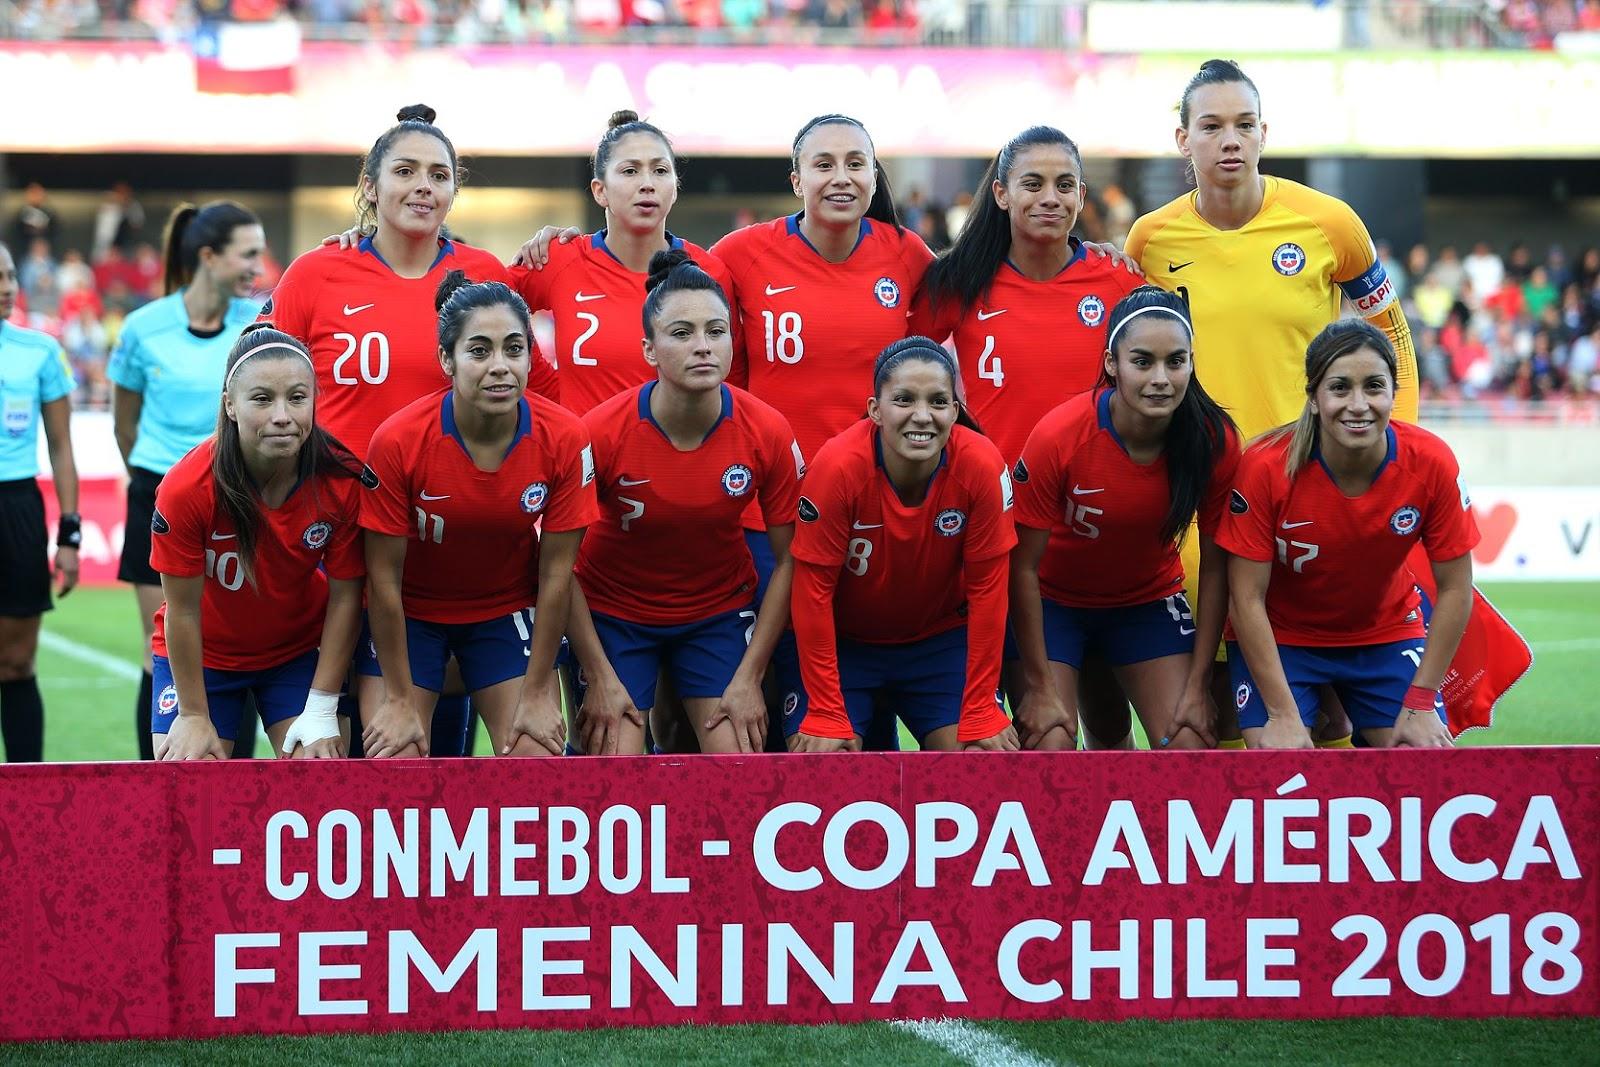 Formación de selección de Chile ante Perú, Copa América Femenina 2018, 12 de abril